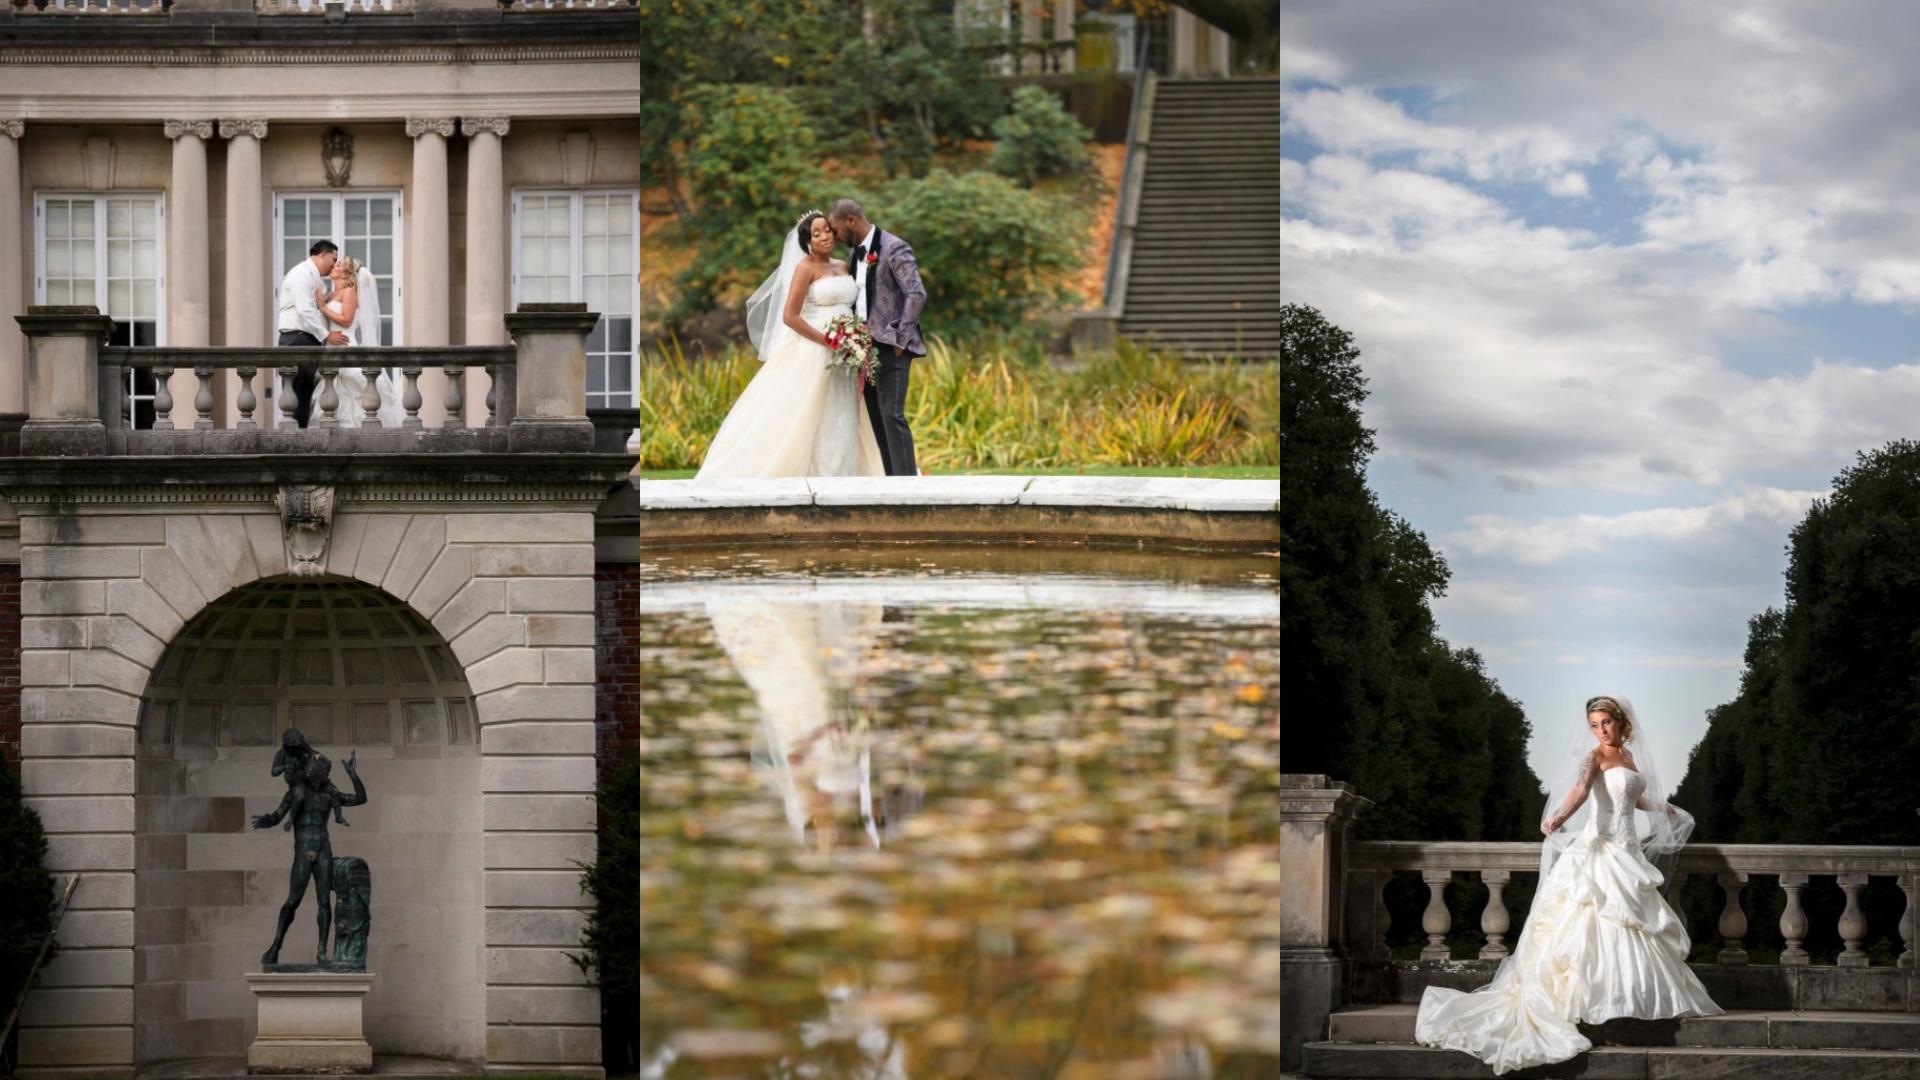 2020_Wedding_Photos_at_Old_Westbury_Gardens_1080p